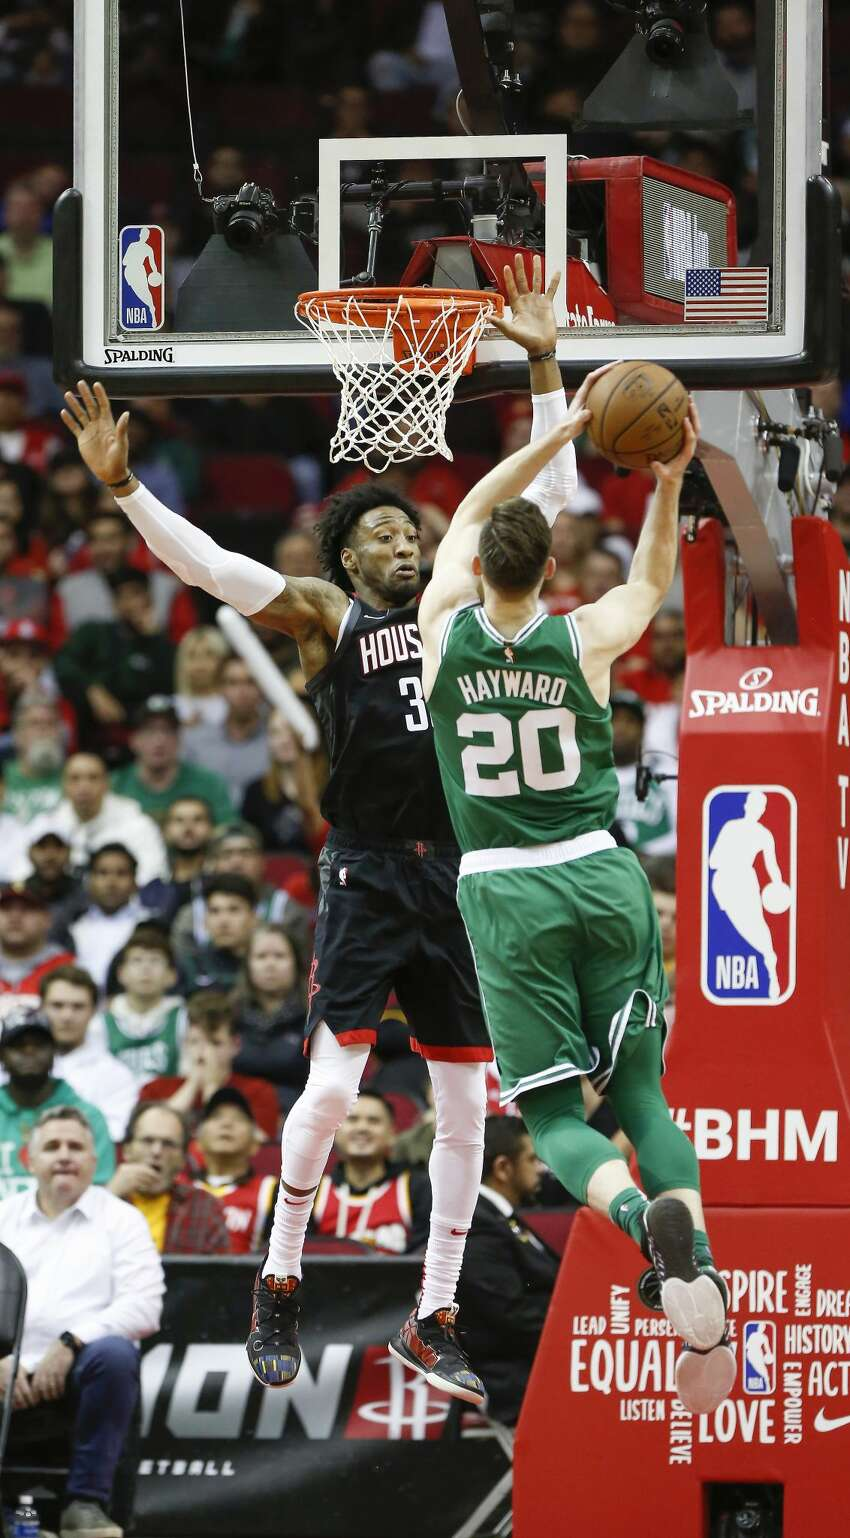 Boston Celtics forward Gordon Hayward (20) is met by Houston Rockets forward Robert Covington (33) during the second half of an NBA basketball game at Toyota Center on Tuesday, Feb. 11, 2020, in Houston.